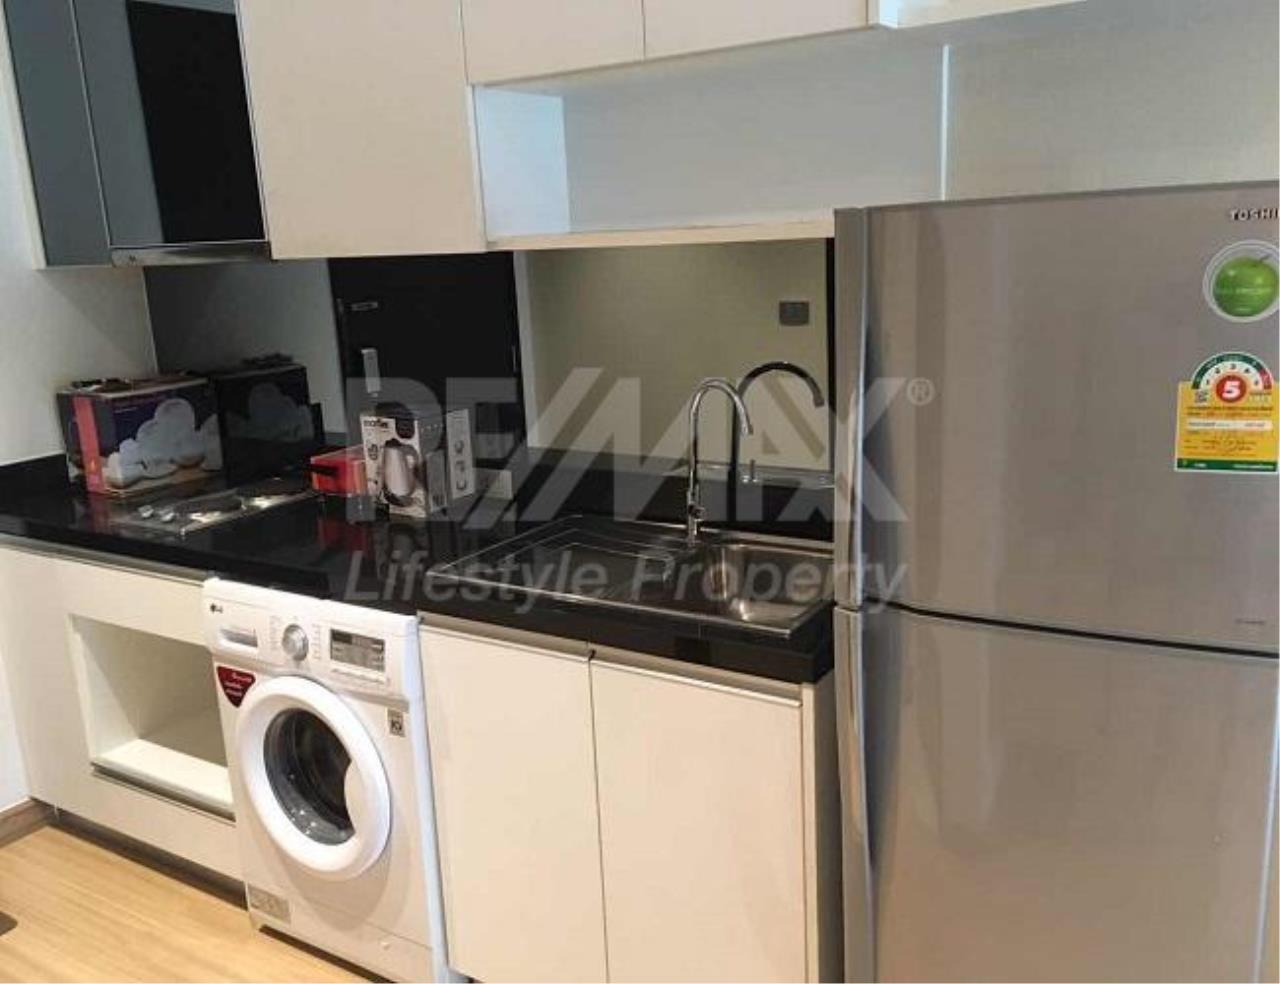 RE/MAX LifeStyle Property Agency's Sky Walk Condominium 5